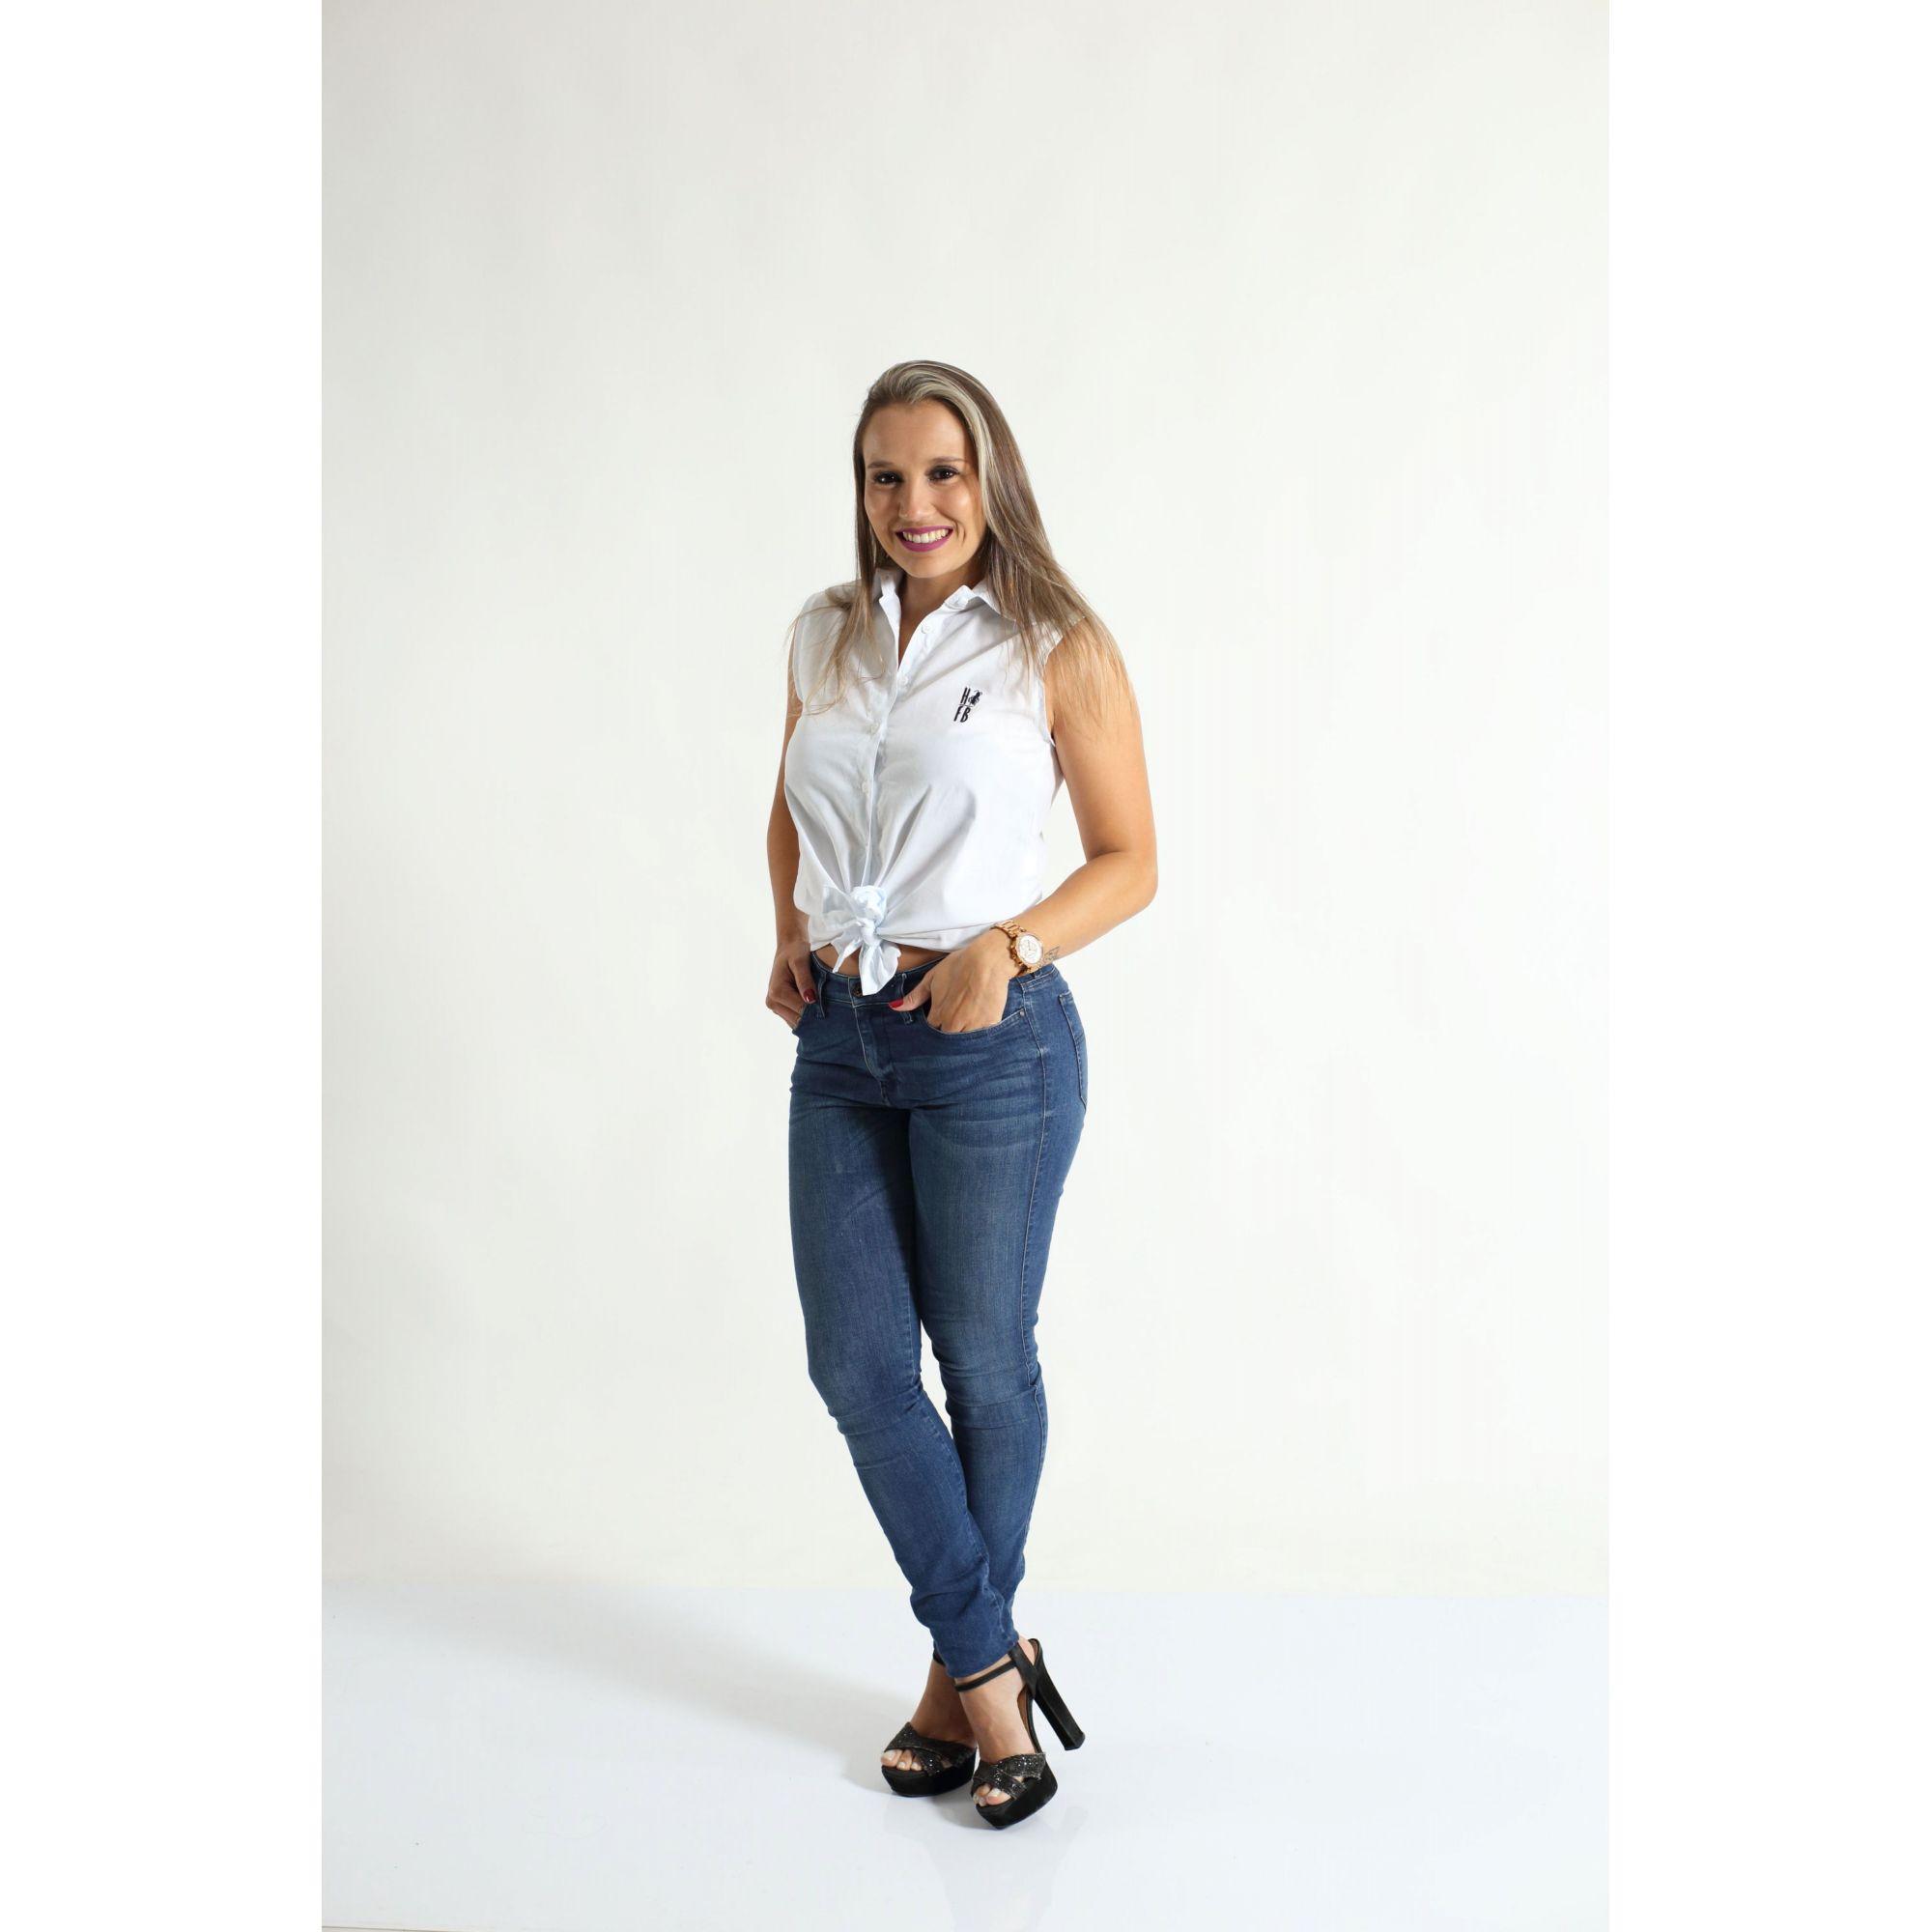 MÃE E FILHO > Kit 02 Camisas Social Adulto e Infantil Branca [Coleção Tal Mãe Tal Filho]  - Heitor Fashion Brazil